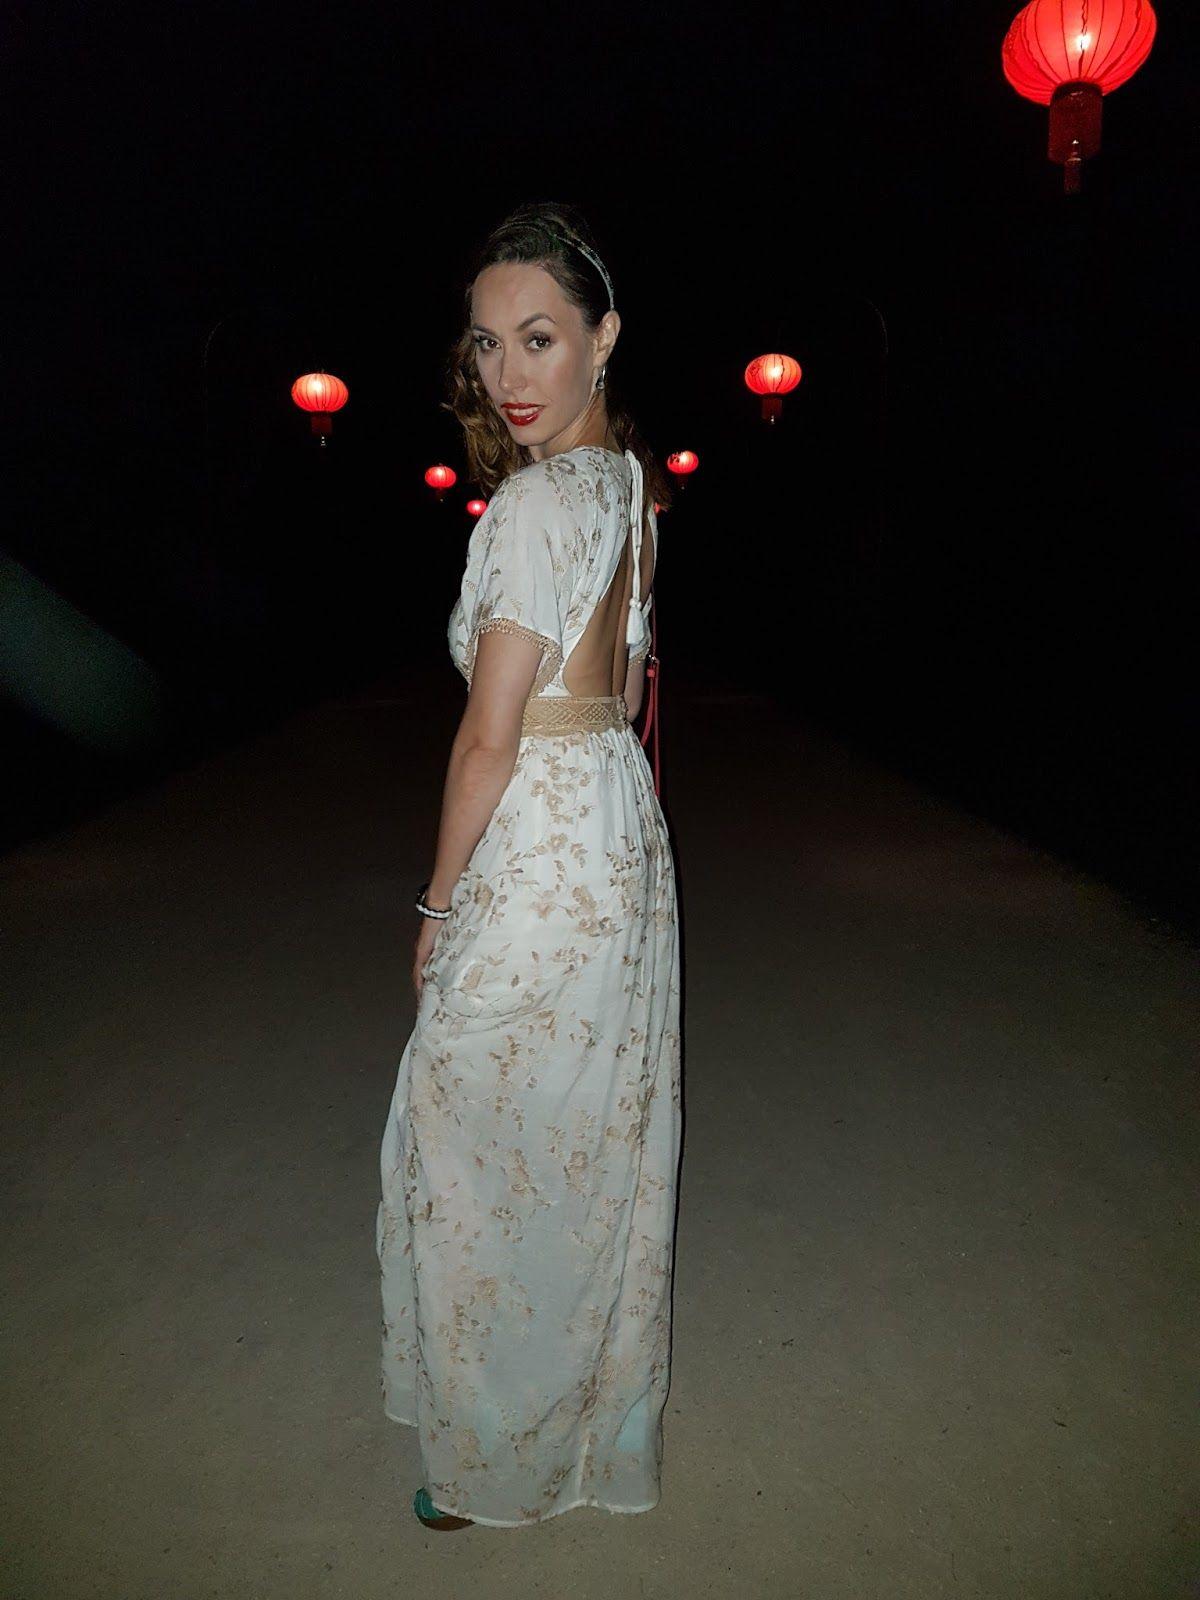 59d0593abd9 Długa, biała sukienka, elegancja w stylu boho.koronki, White maxi dress,  elegant boho style, laces, floral embroidery